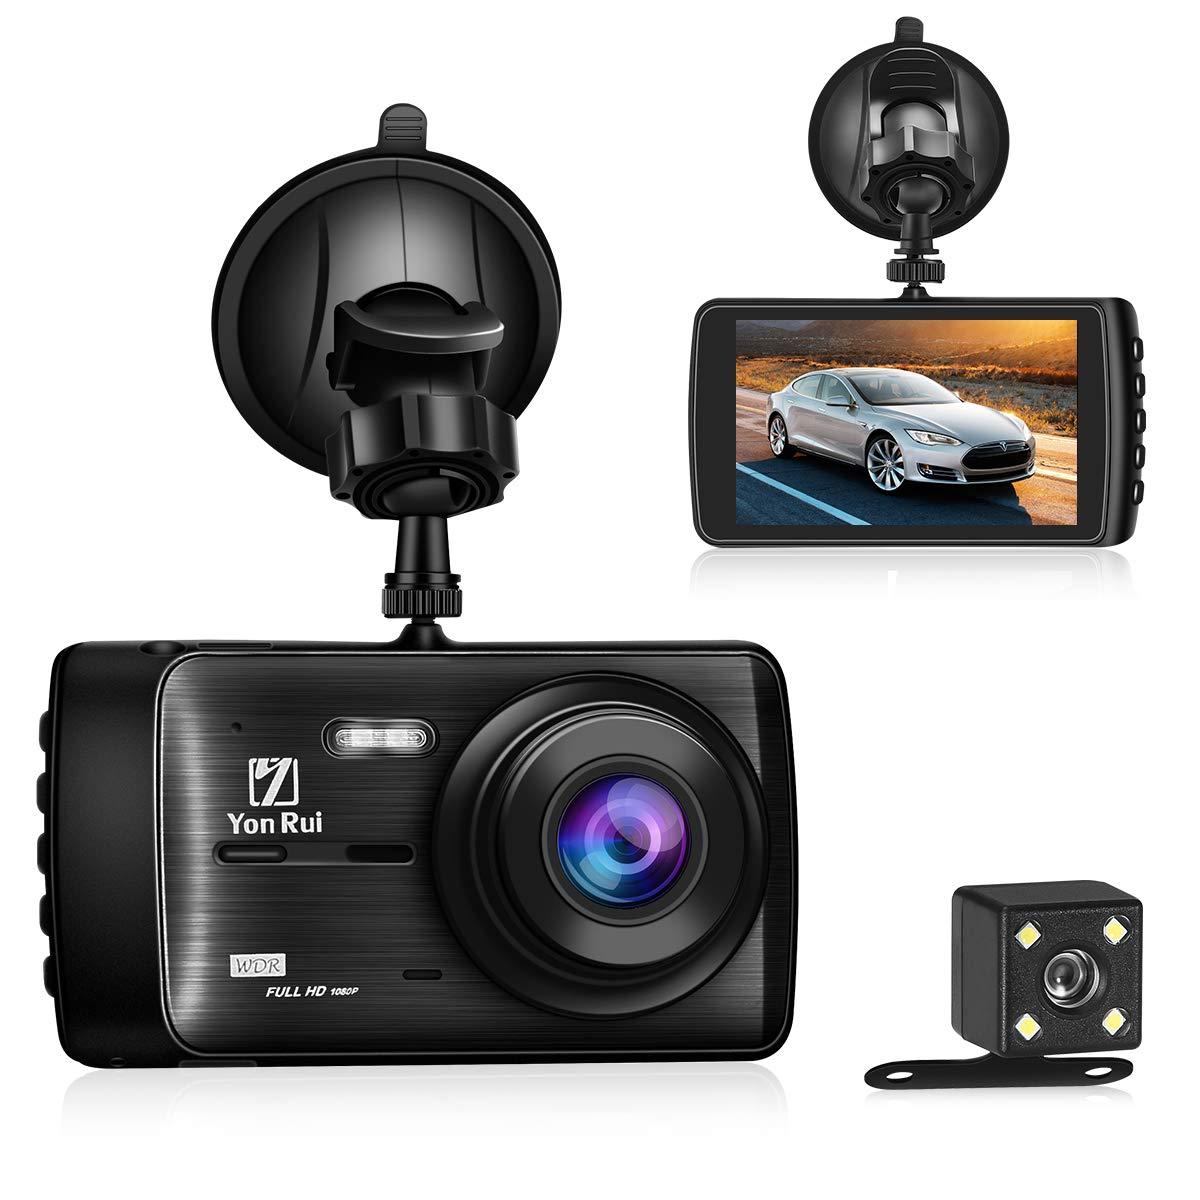 Parts & Accessories Shop For Cheap 170° Auto Car Dvr Wide Angle Dash Cam Video Recorder Adas G-sensor Mini 1080p We Take Customers As Our Gods